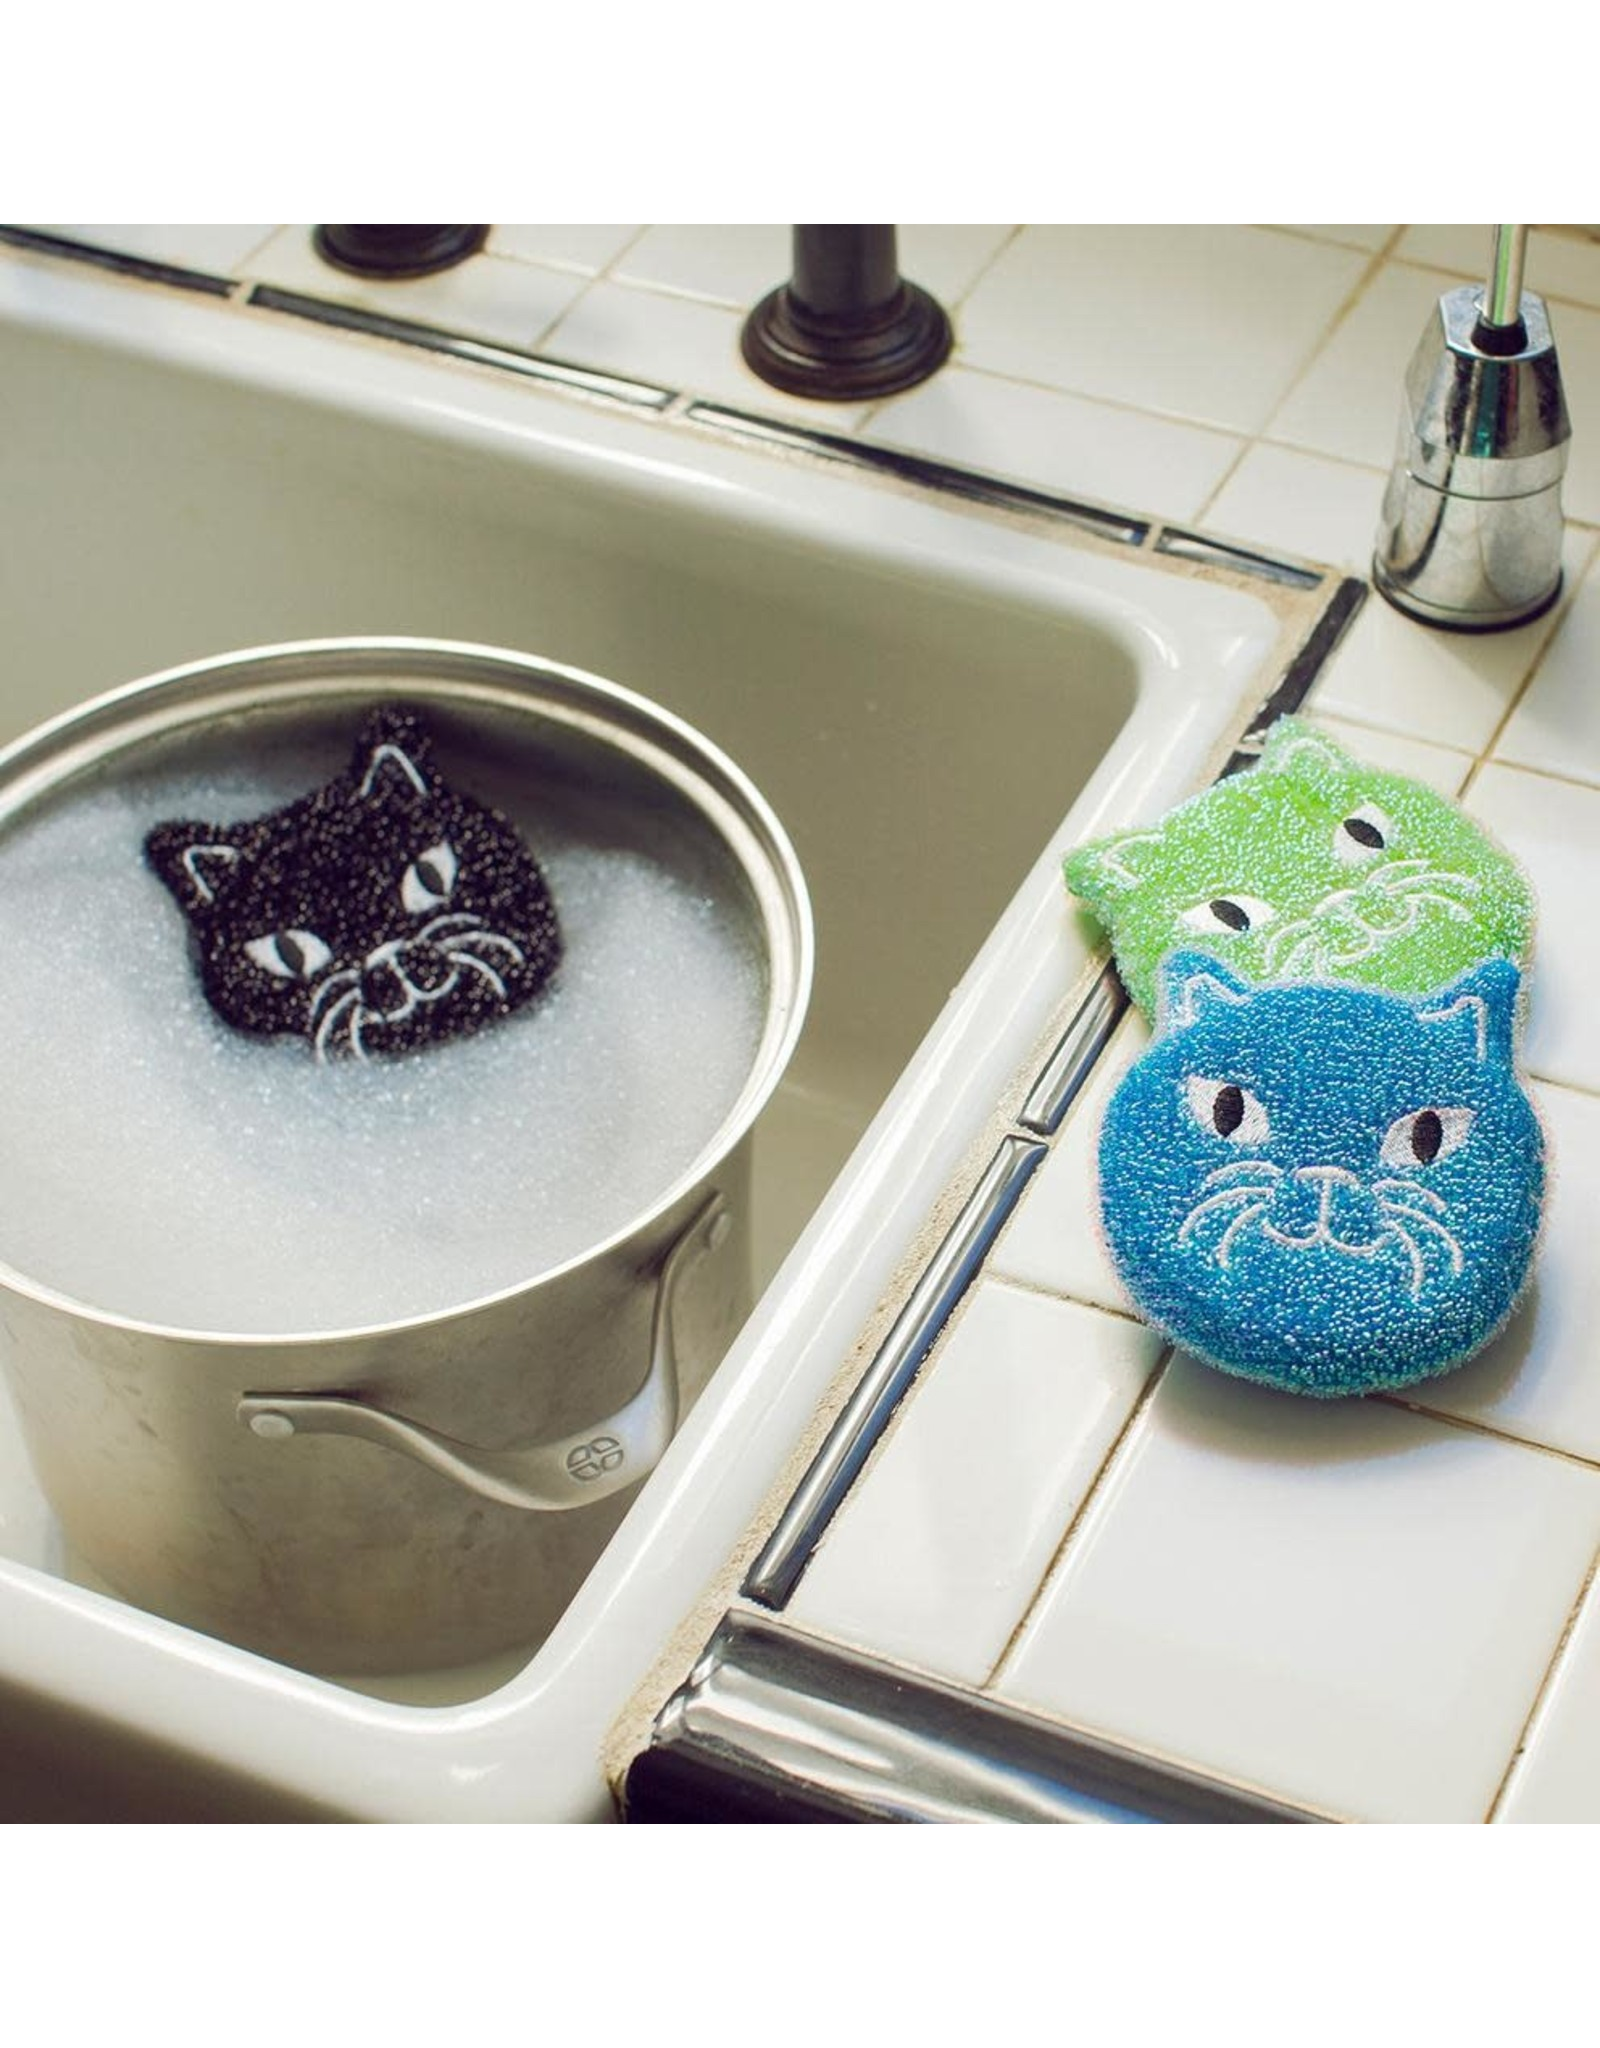 Kitty Scrub Sponges - Set of 3